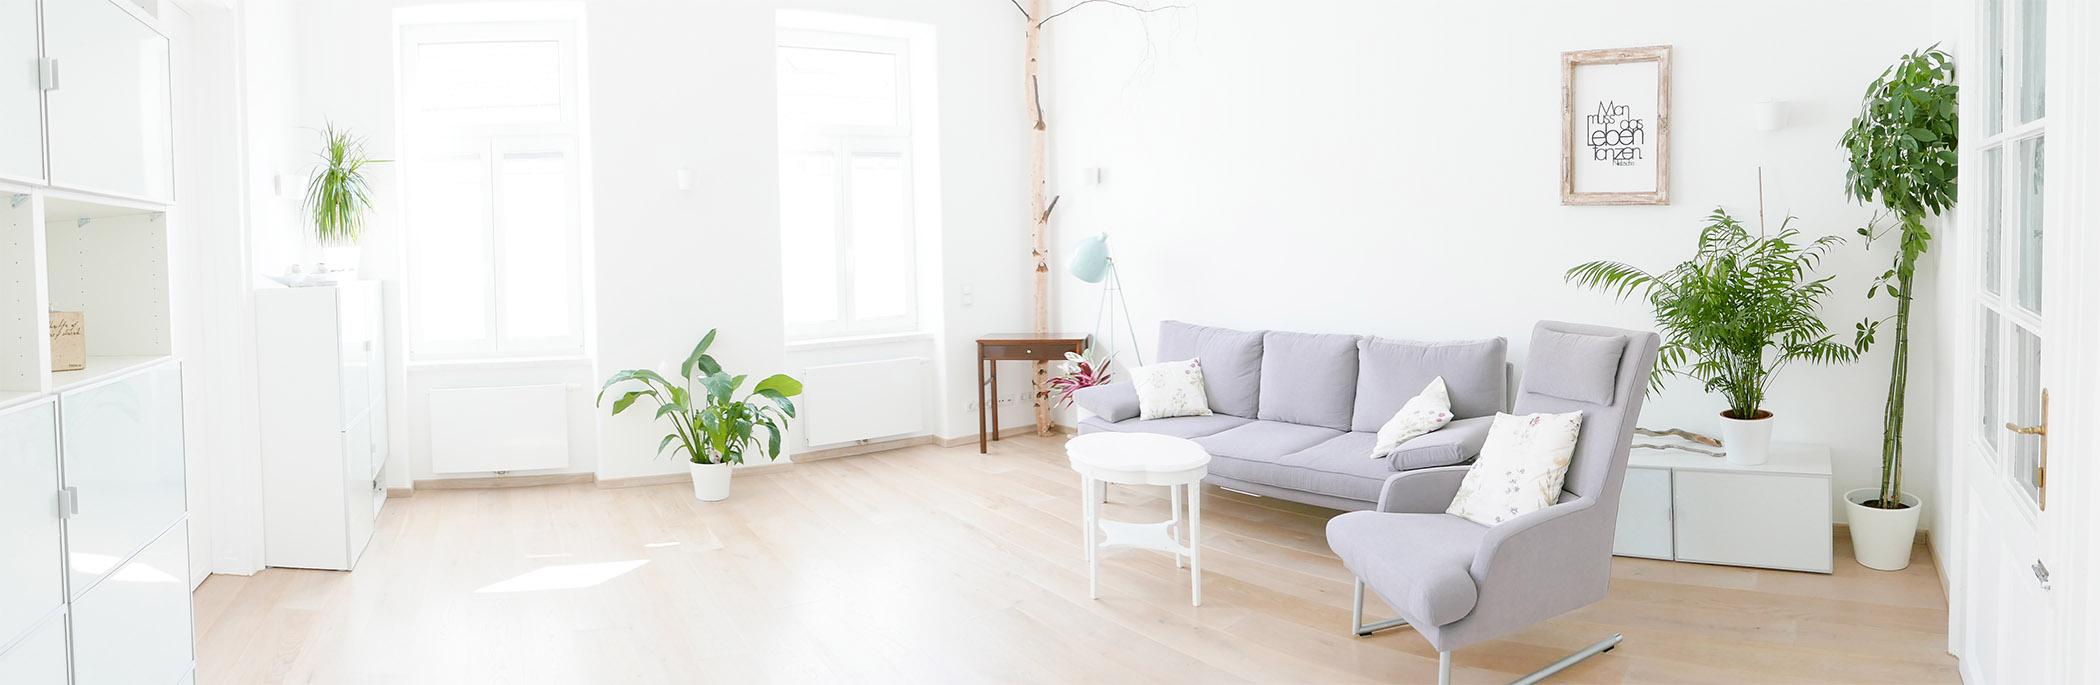 großzügiger, heller Therapie-Raum